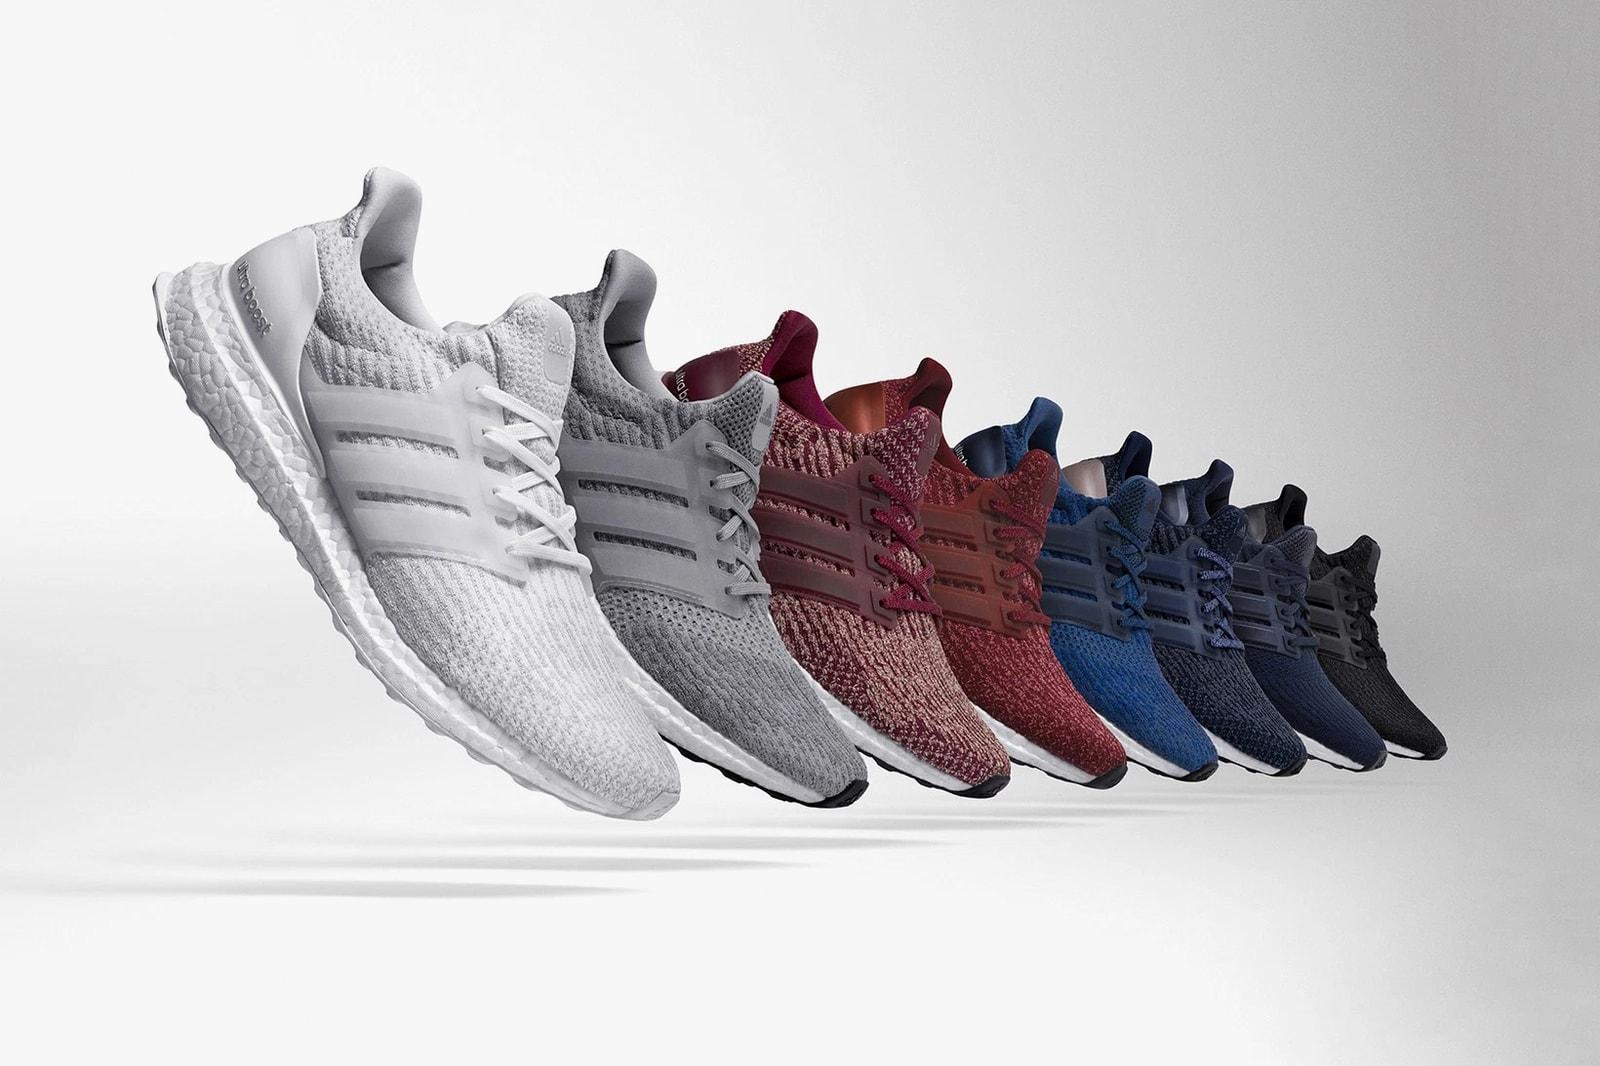 adidas-ultra-boost-3-0-01